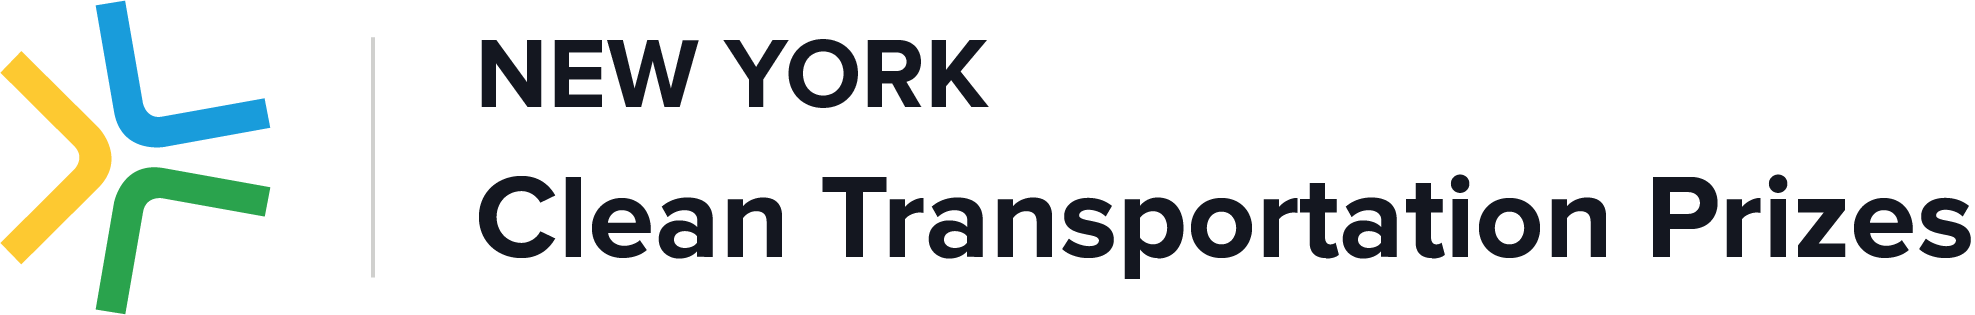 New York Clean Transportation Prizes